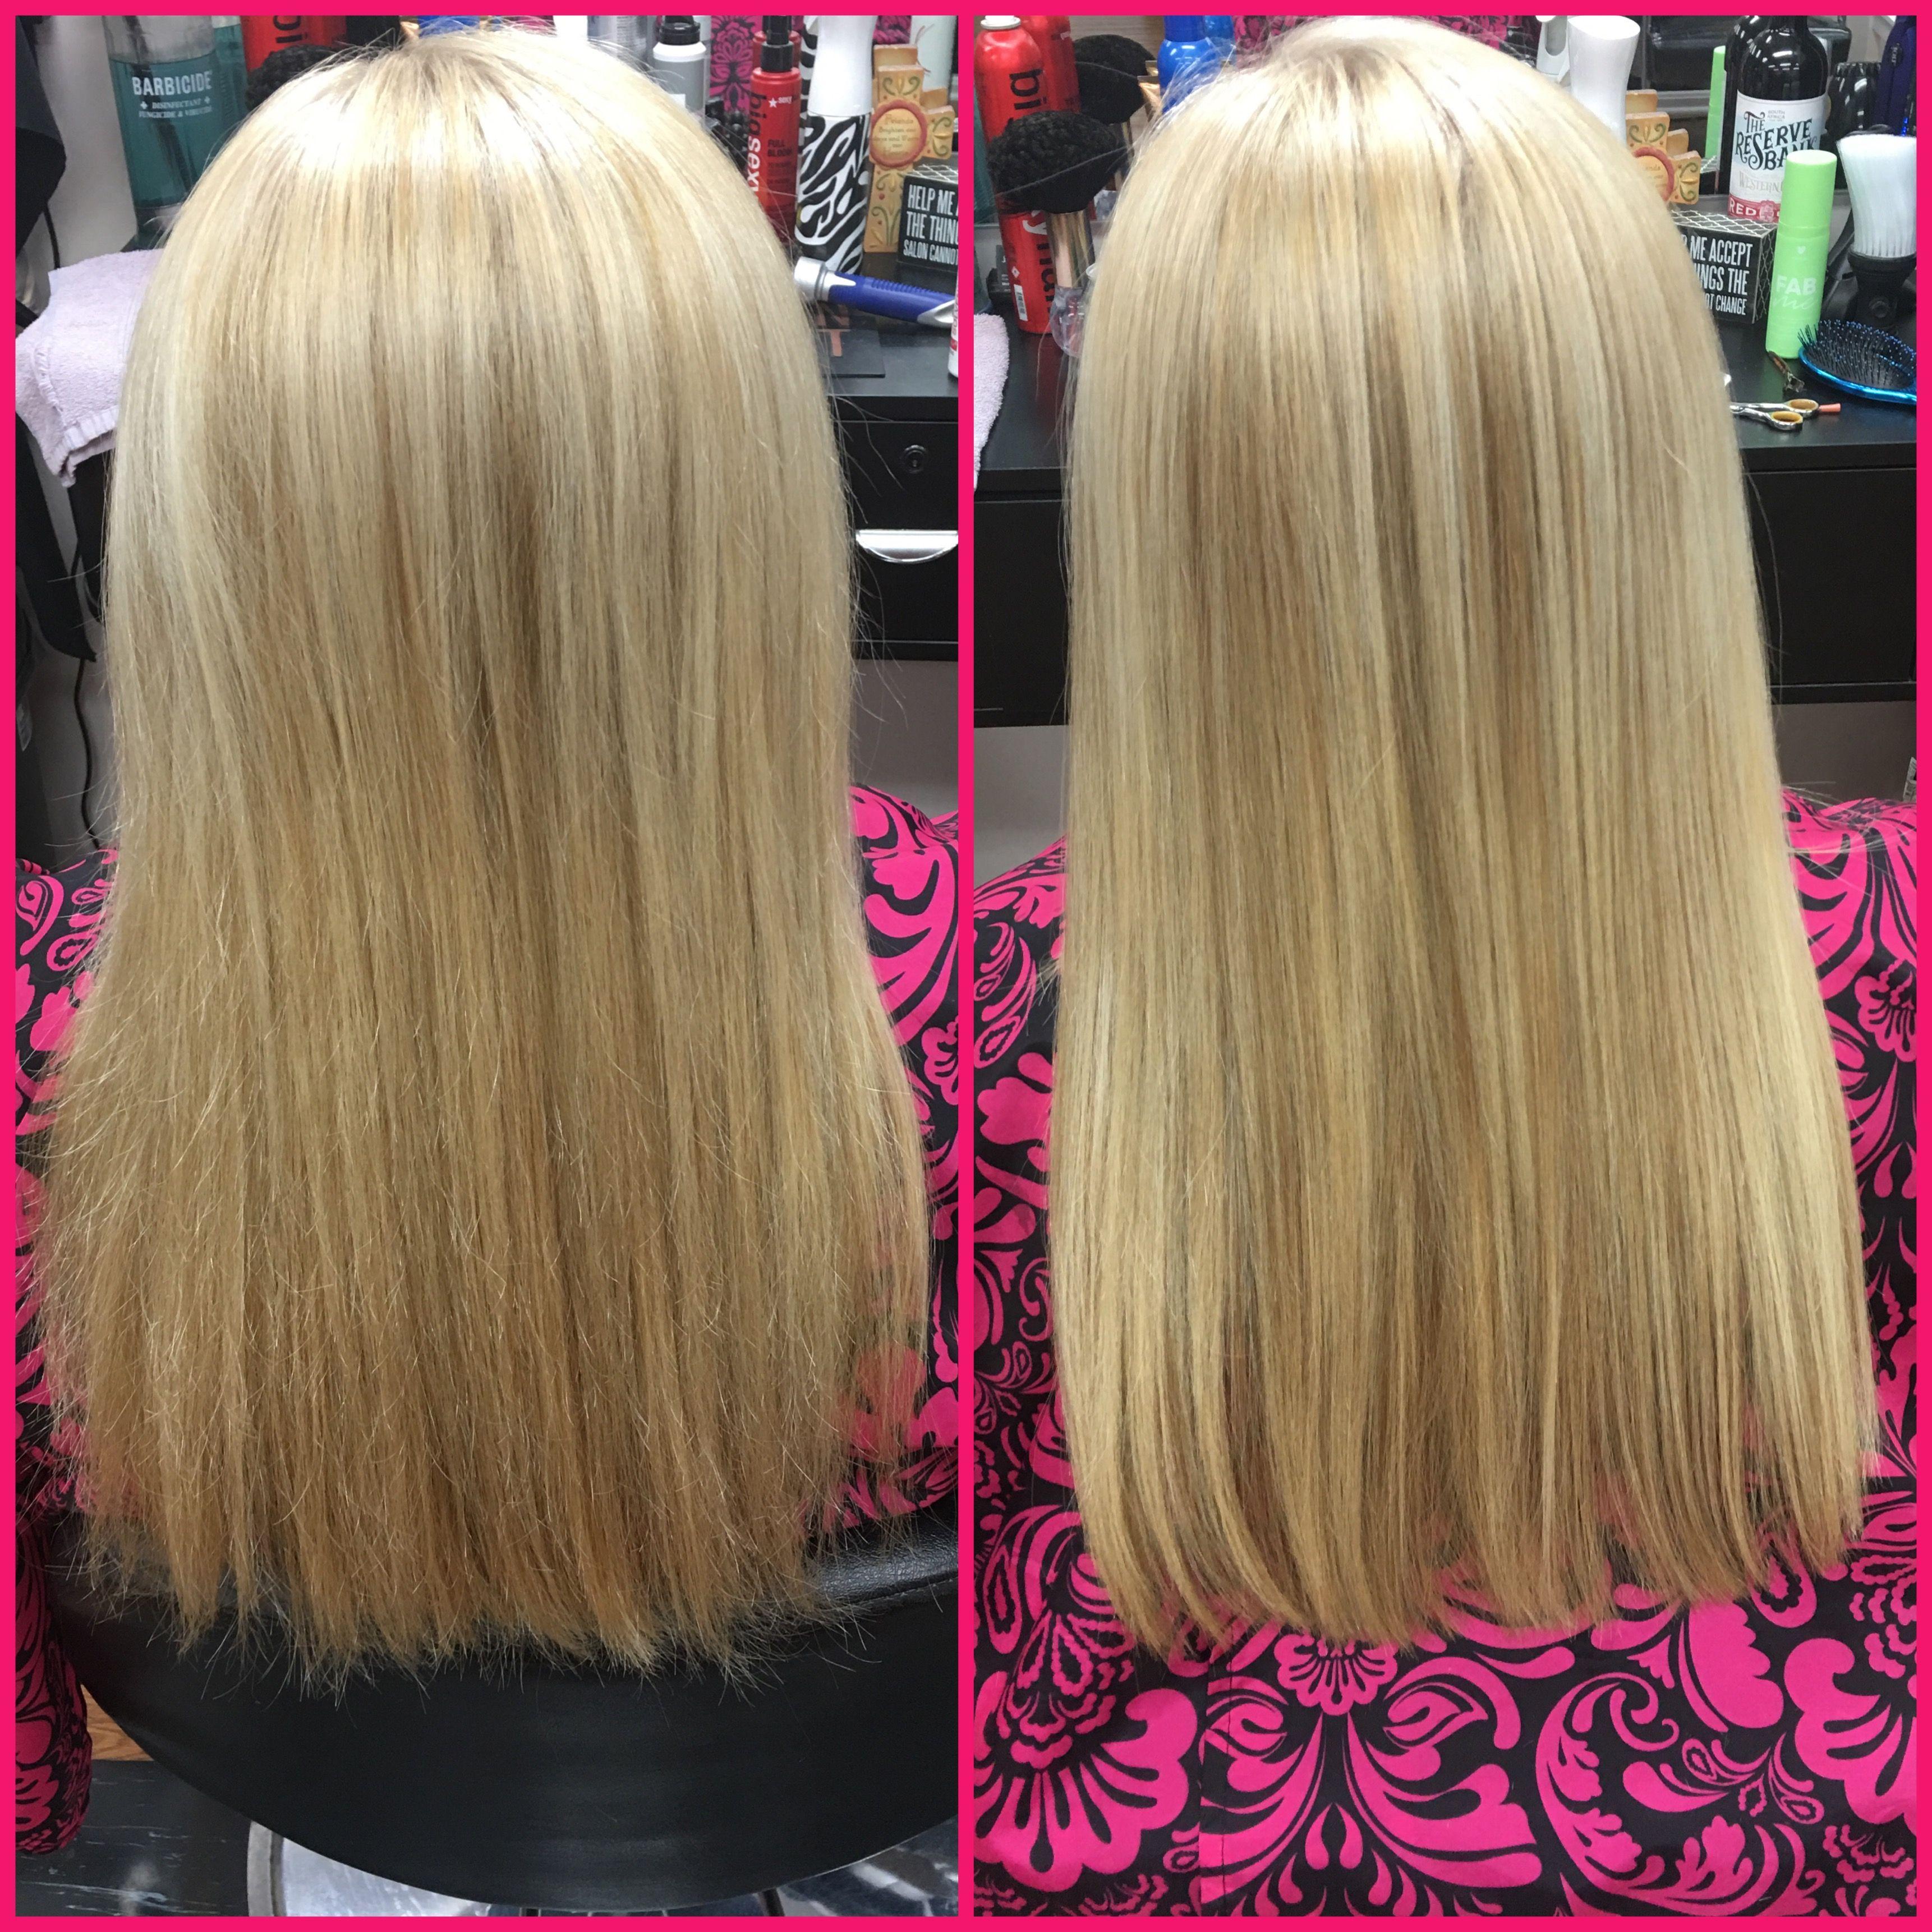 Brazilian Blowout Brazilian Blowout Long Hair Styles Hair Styles